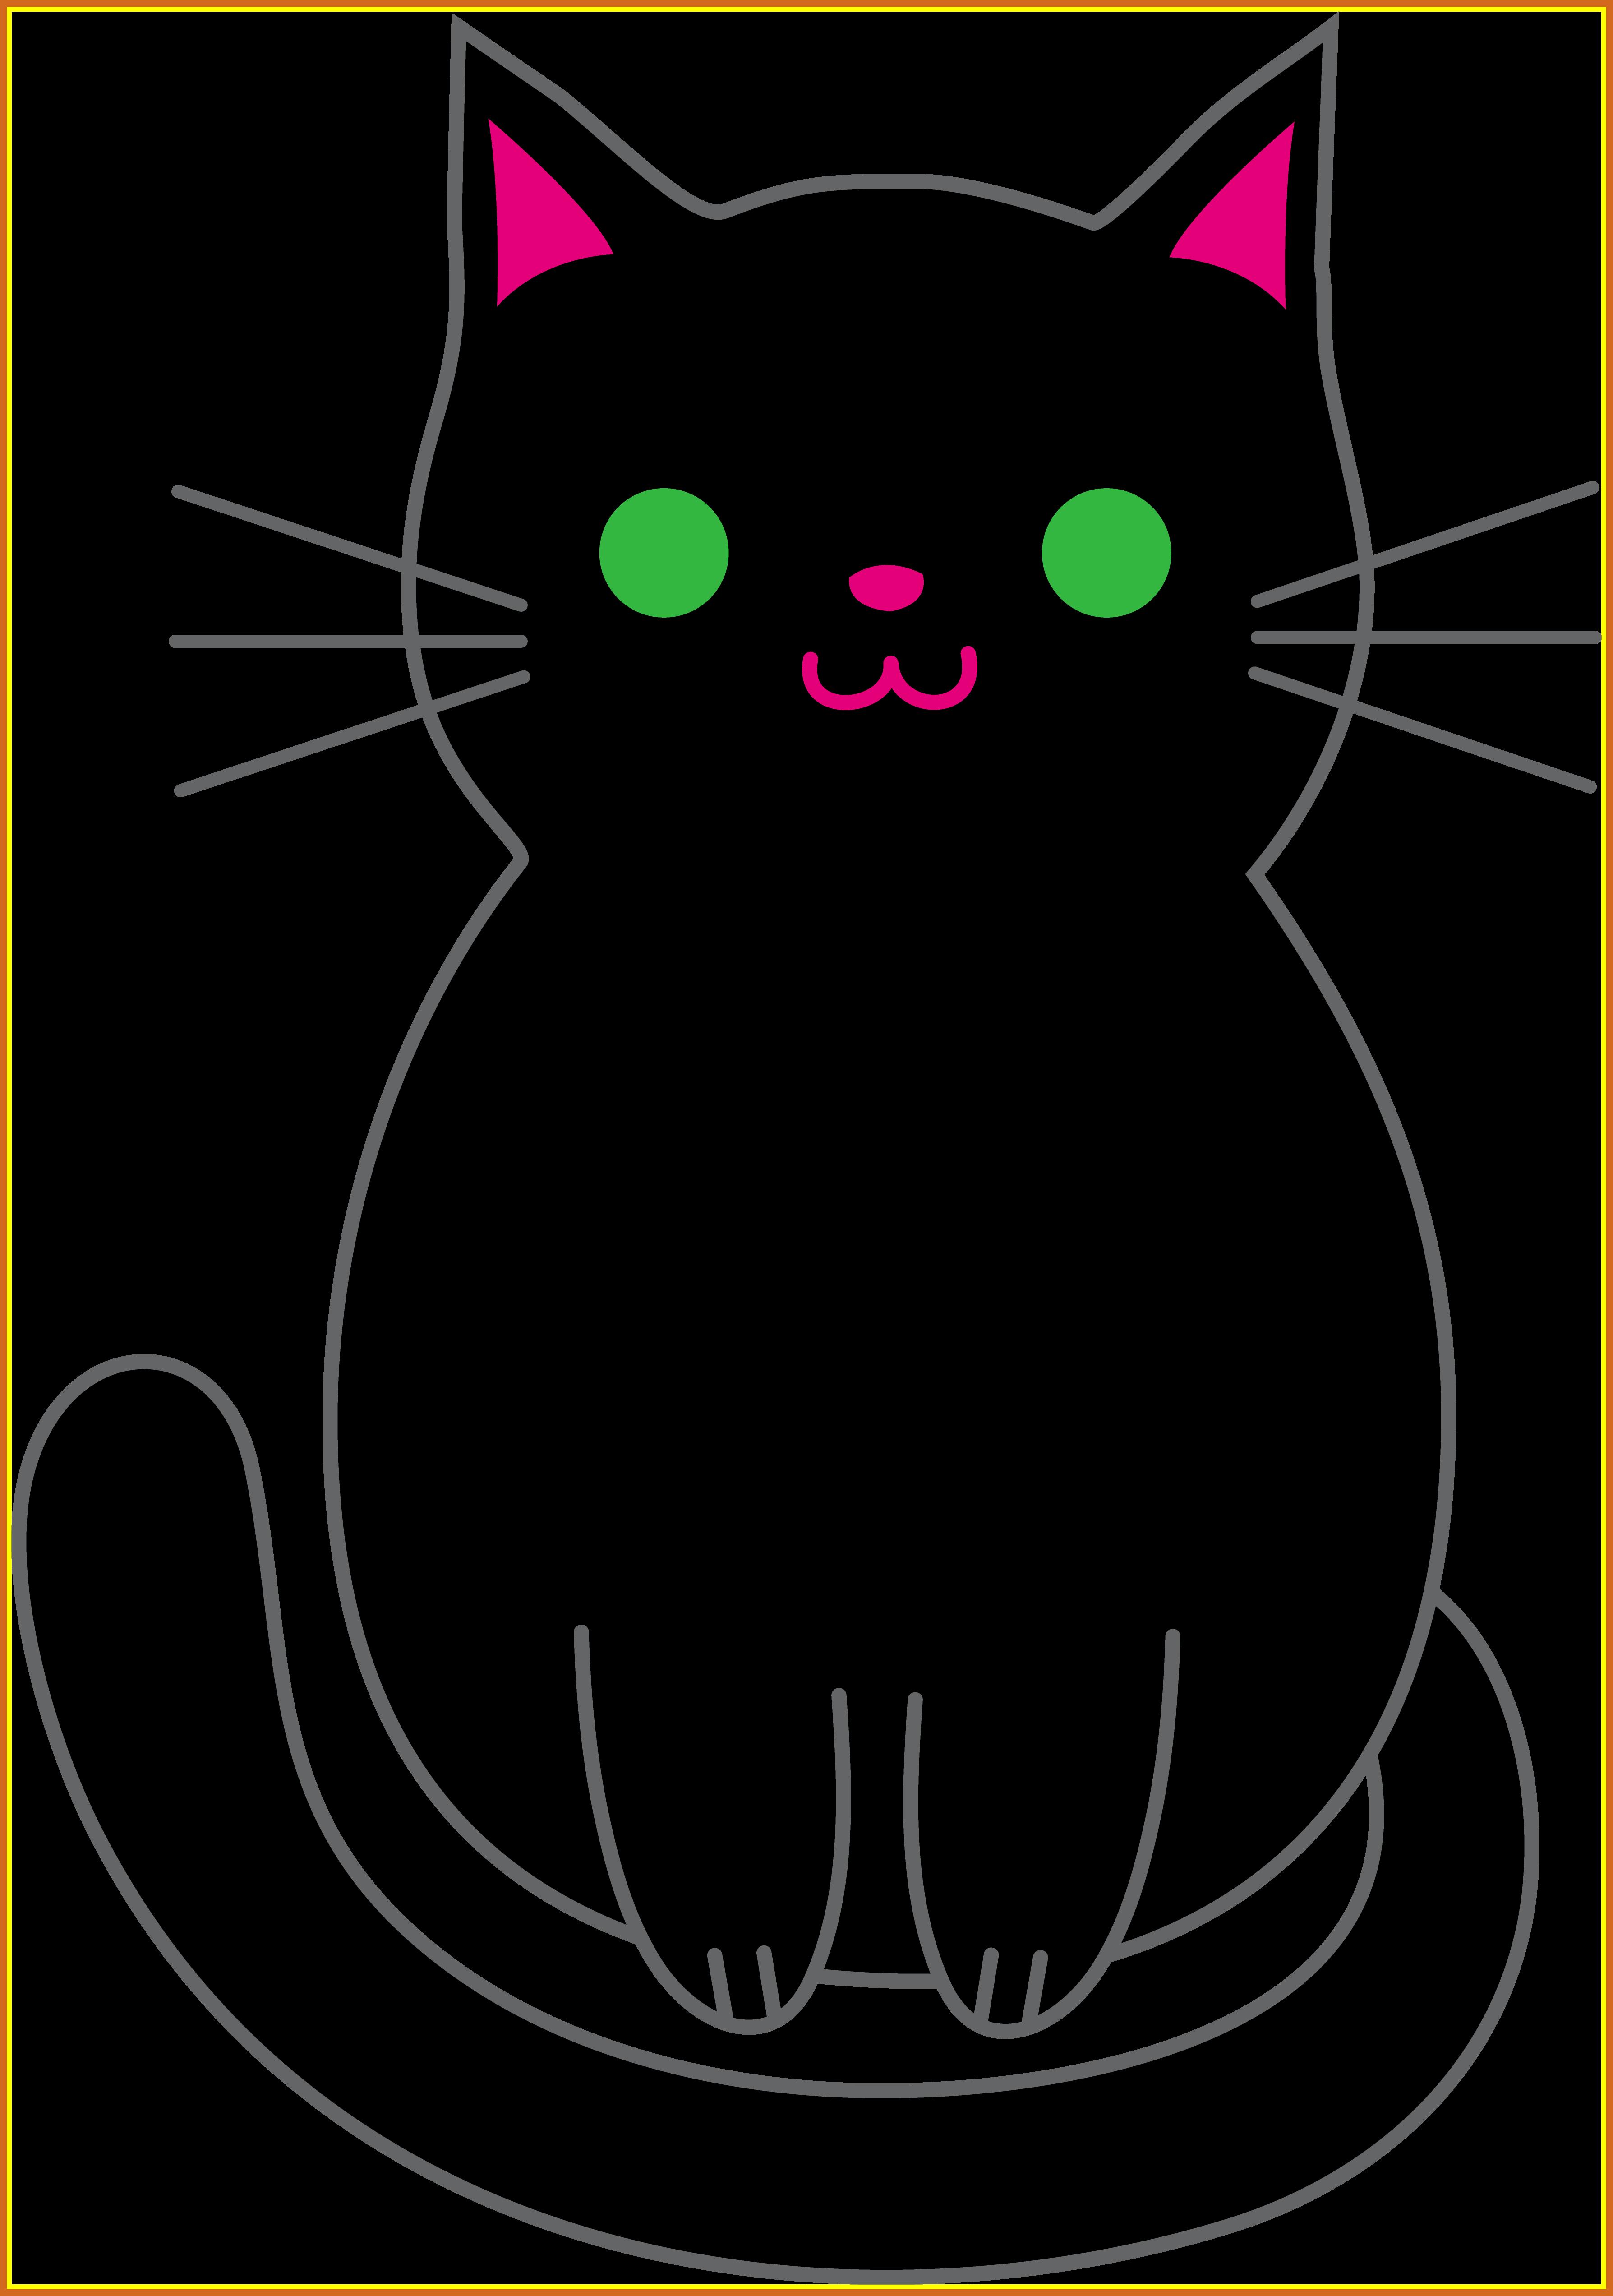 Kittens clipart yarn clip art. Fascinating cute black kitten